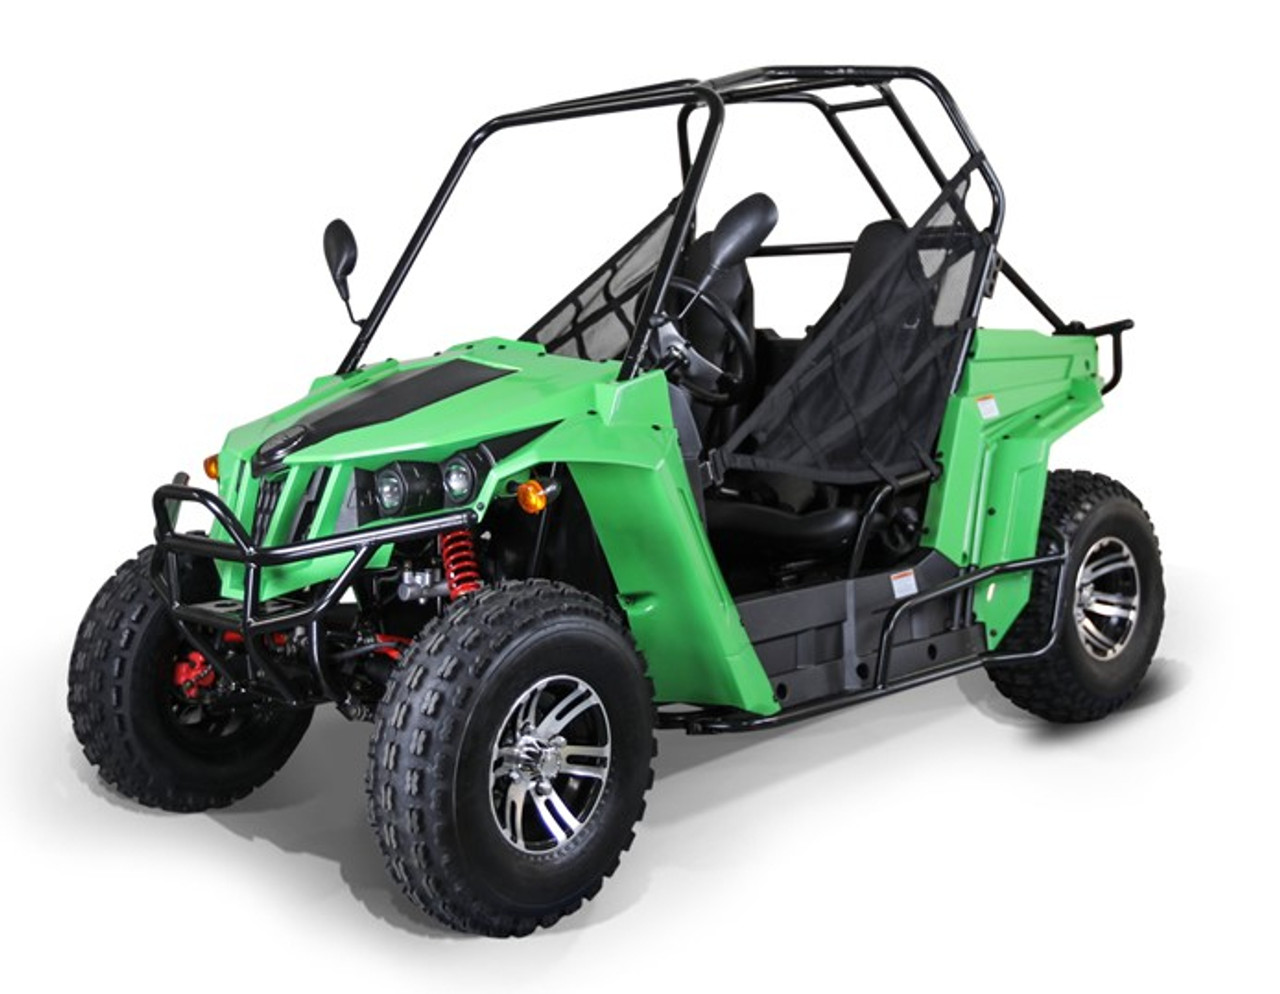 Side By Side Utv >> Orion Enforcer 150cc Mini Utv Side X Side